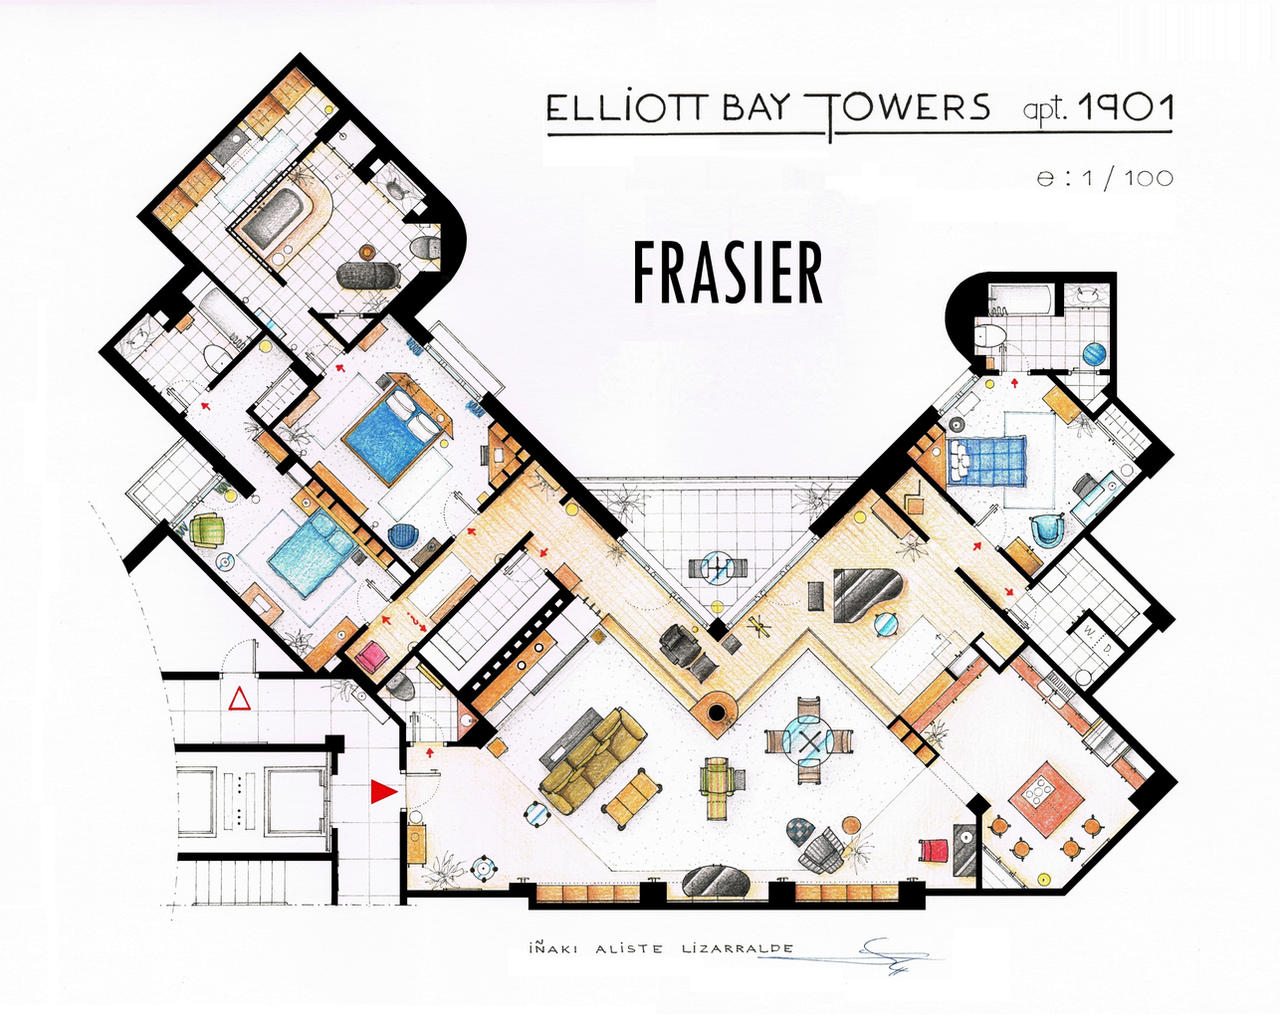 Frasier's Apartment Floorplan - Old version by nikneuk